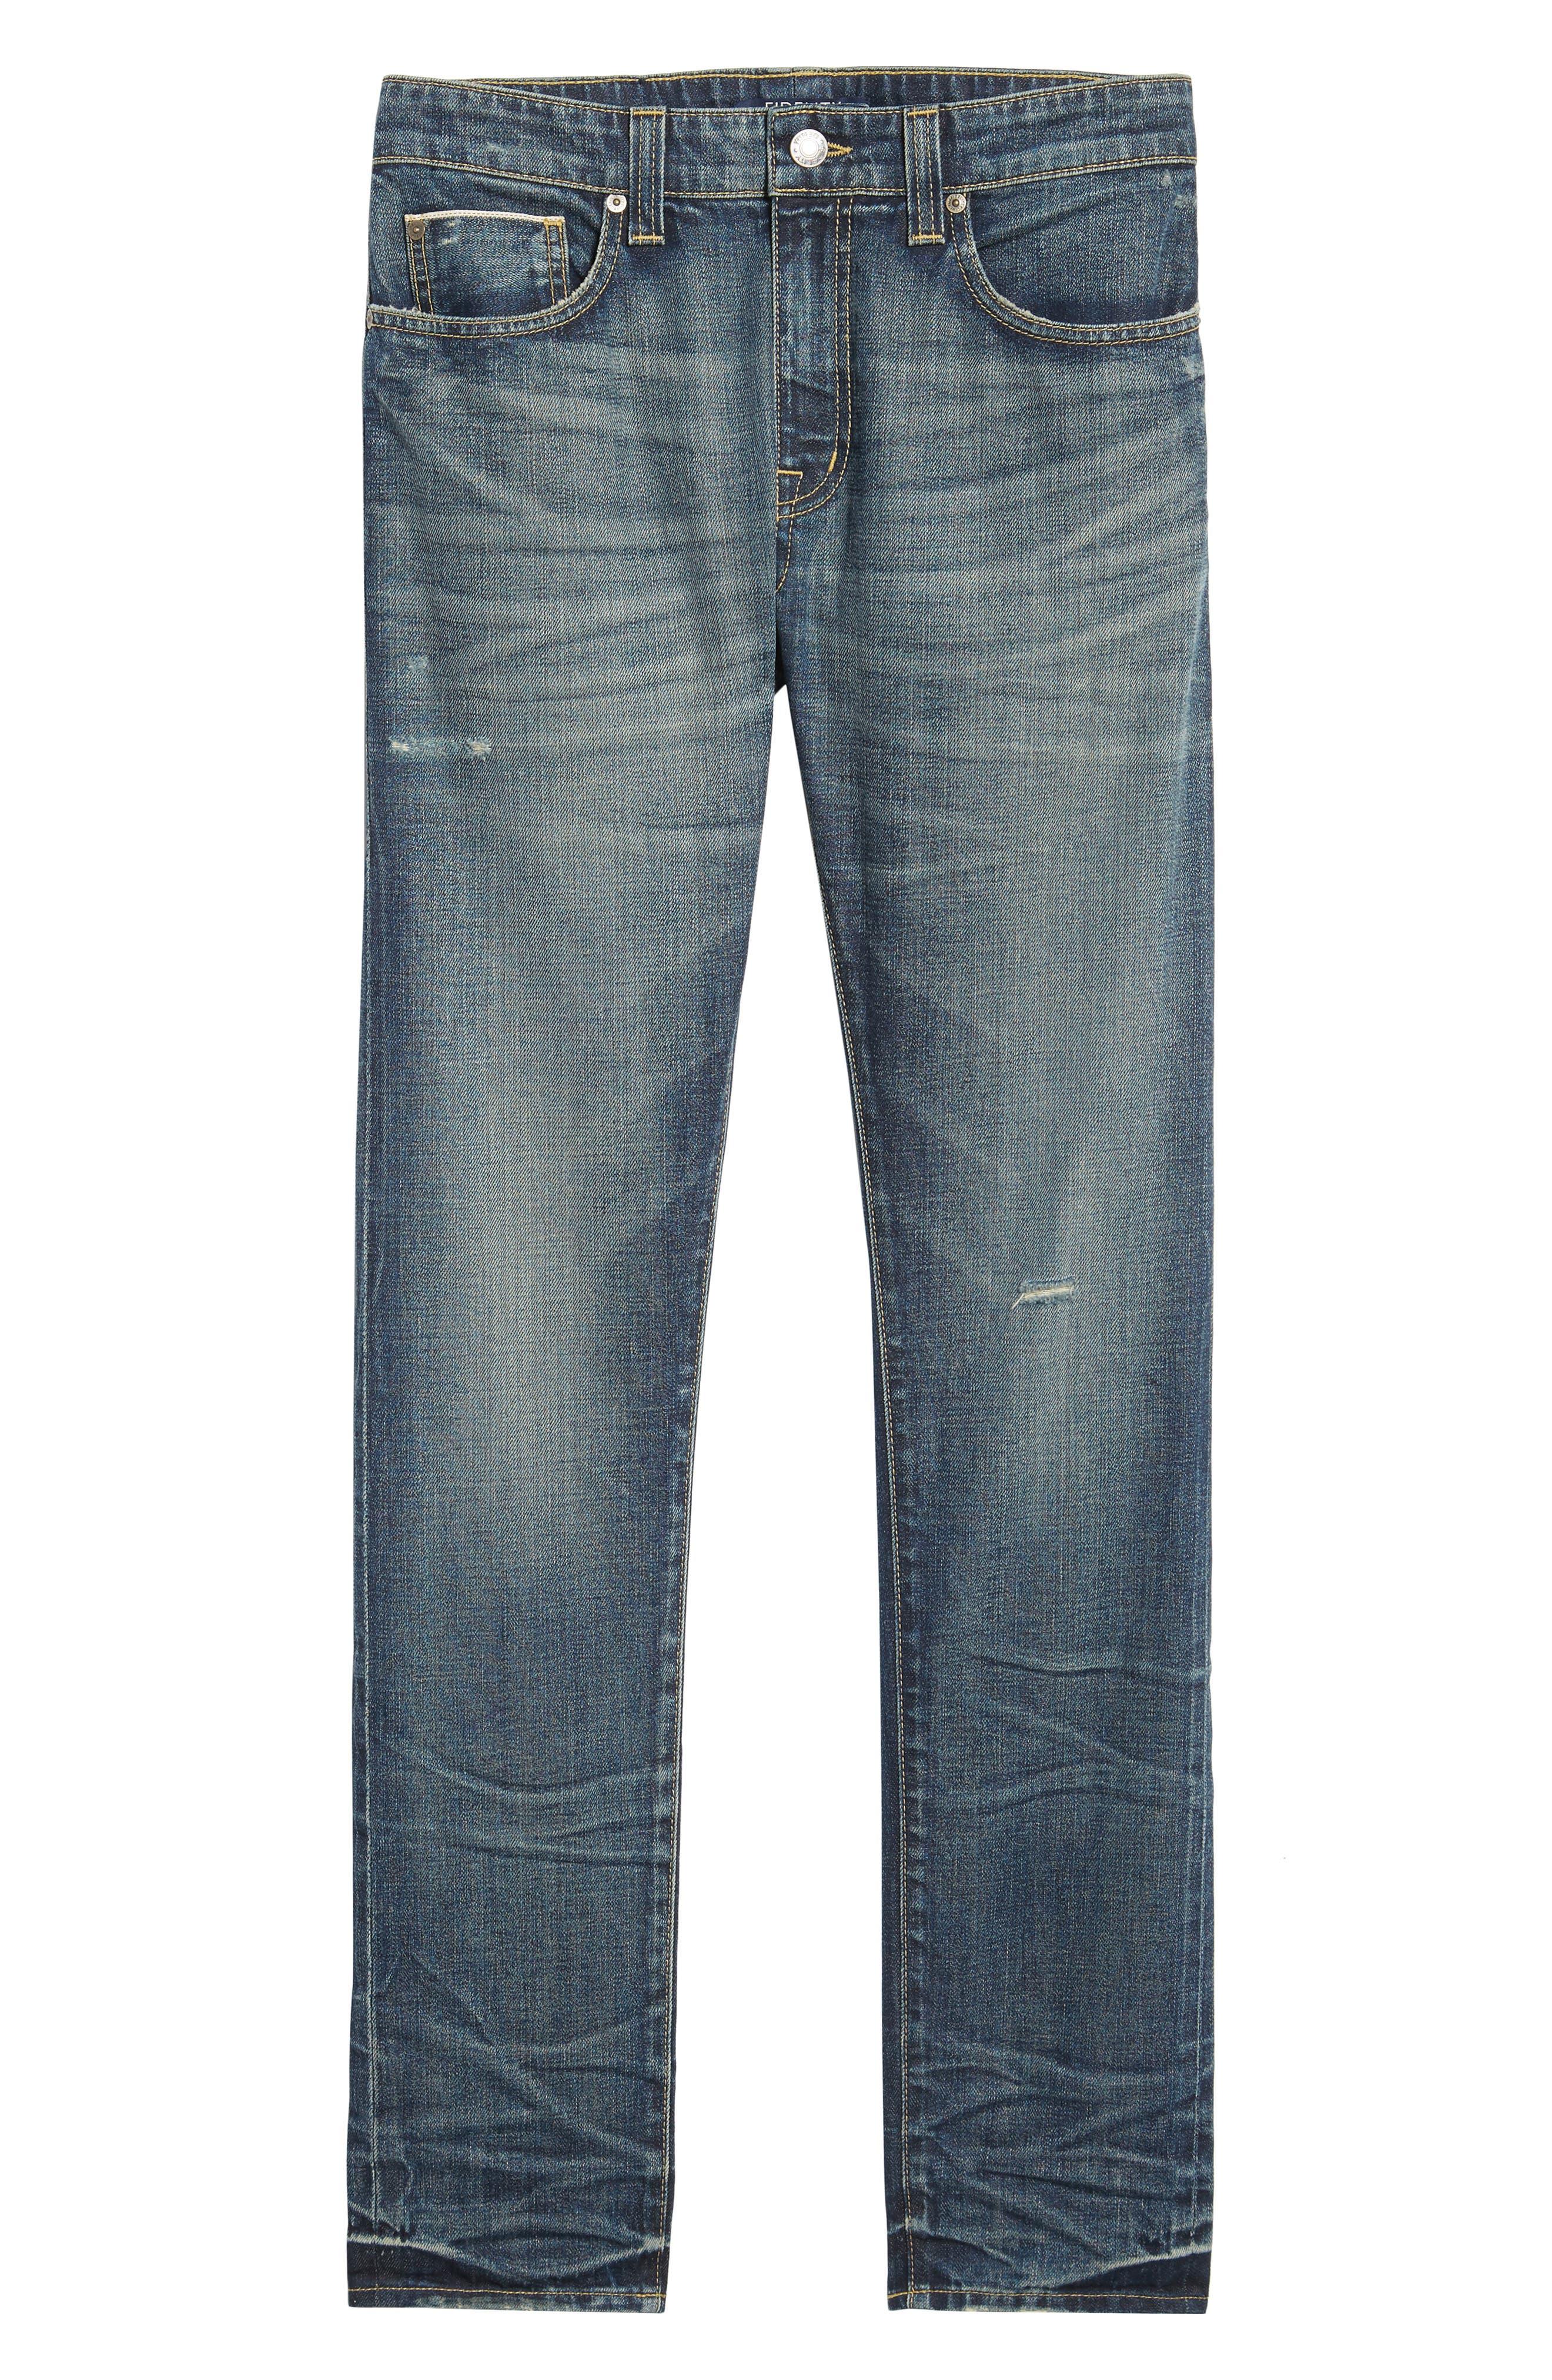 Fideltiy Denim Torino Slim Fit Jeans,                             Alternate thumbnail 6, color,                             Crystal Blue